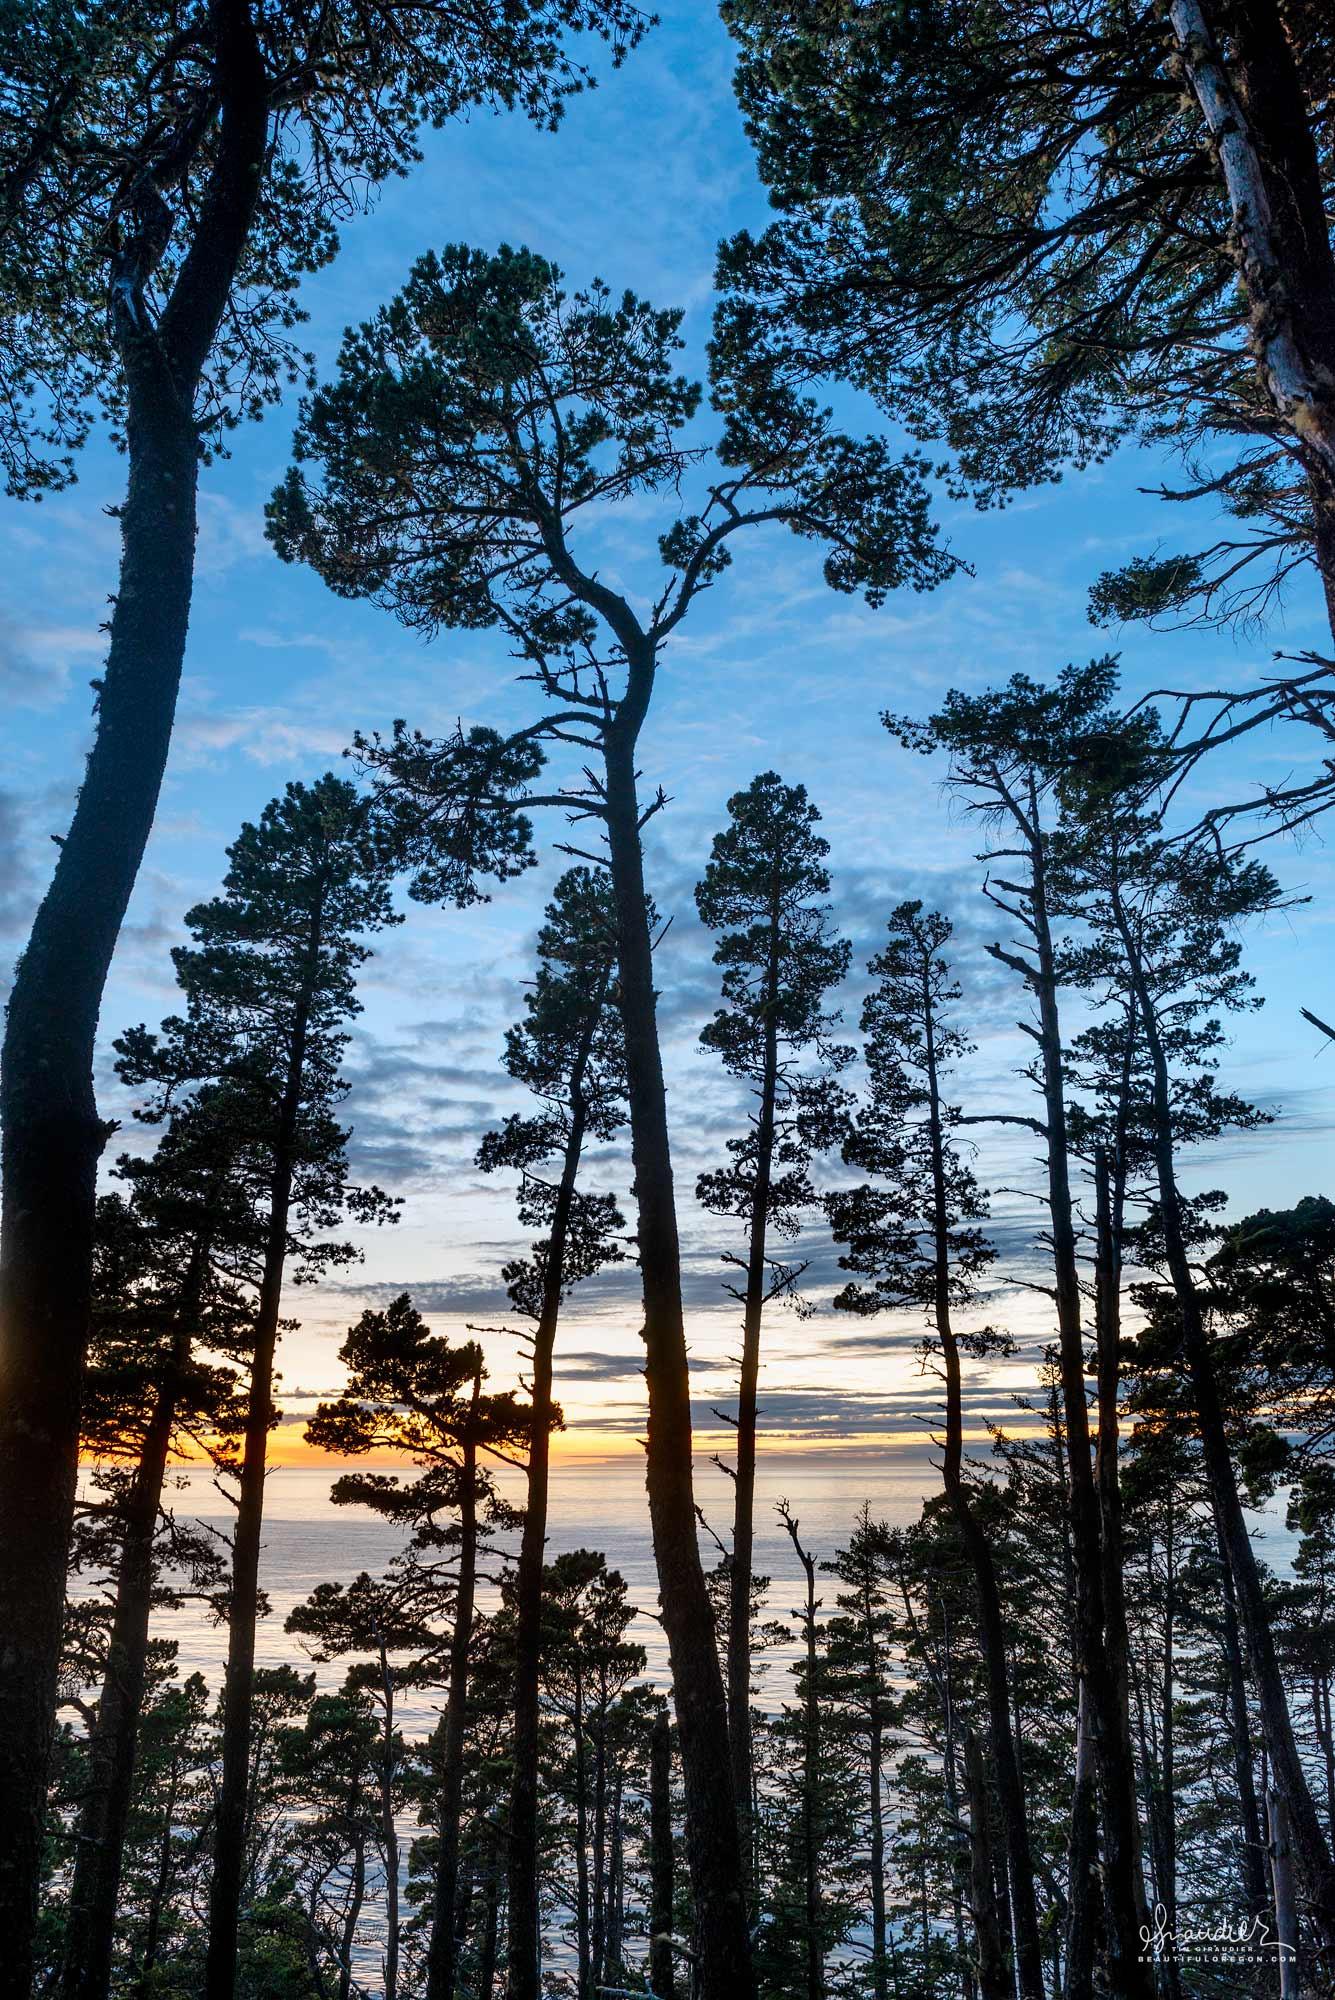 Cape Sebastian coastal pine forest at sunset. Curry County, South Oregon Coast.